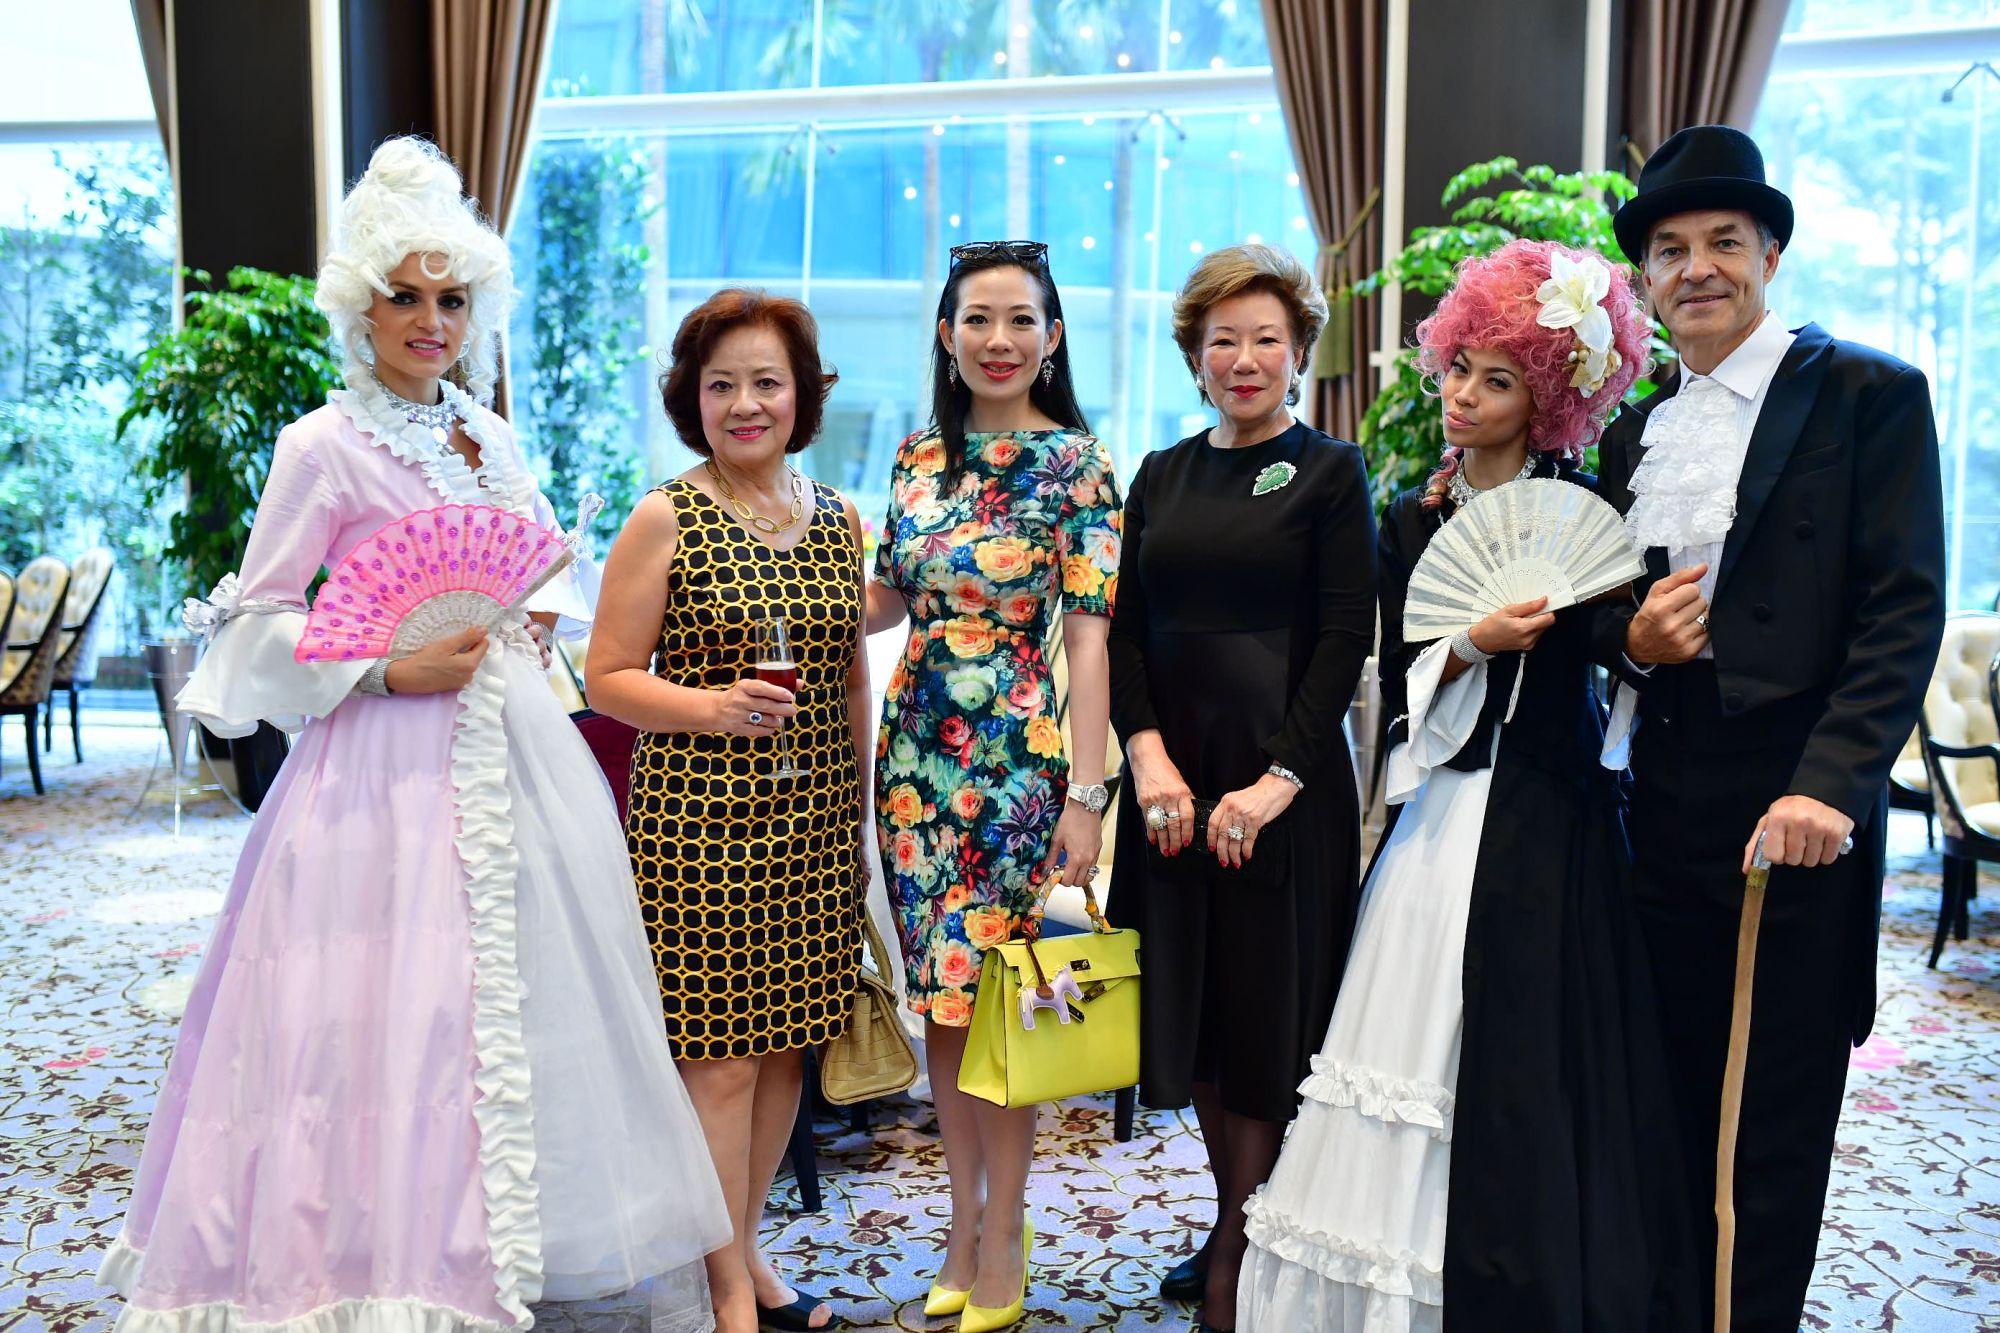 Irene Choo, Stephanie Lee, Jessie Lee